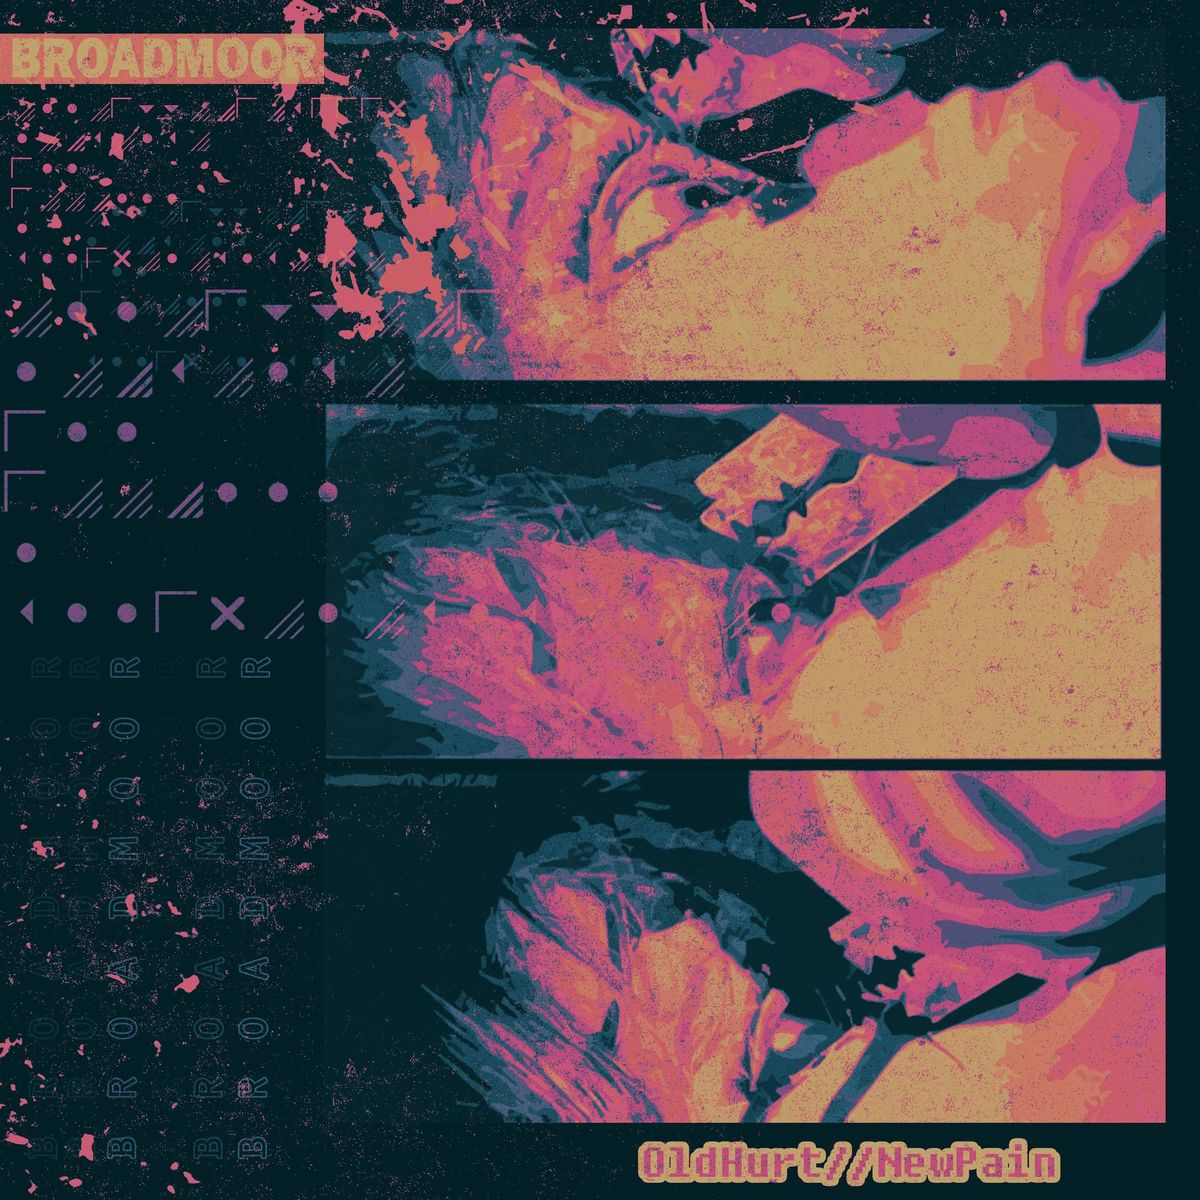 Broadmoor - OldHurt//NewPain [EP] (2020)